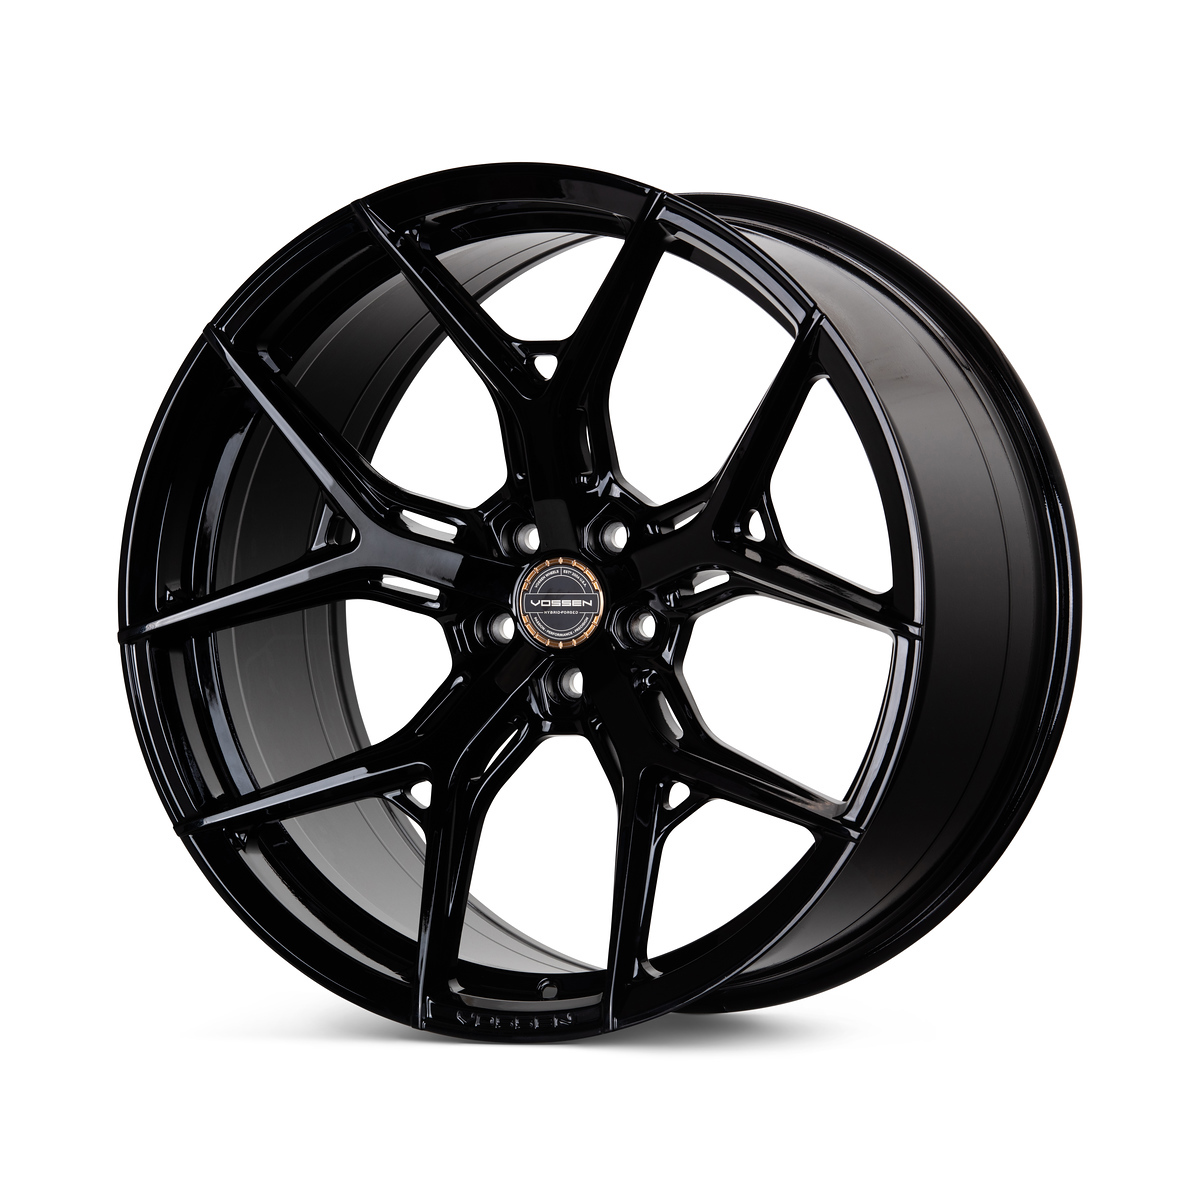 vossen-hf-5---c25-gloss-black---hybrid-forged-series----vossen-wheels-2019----0002_49179392181_o-X3.jpg